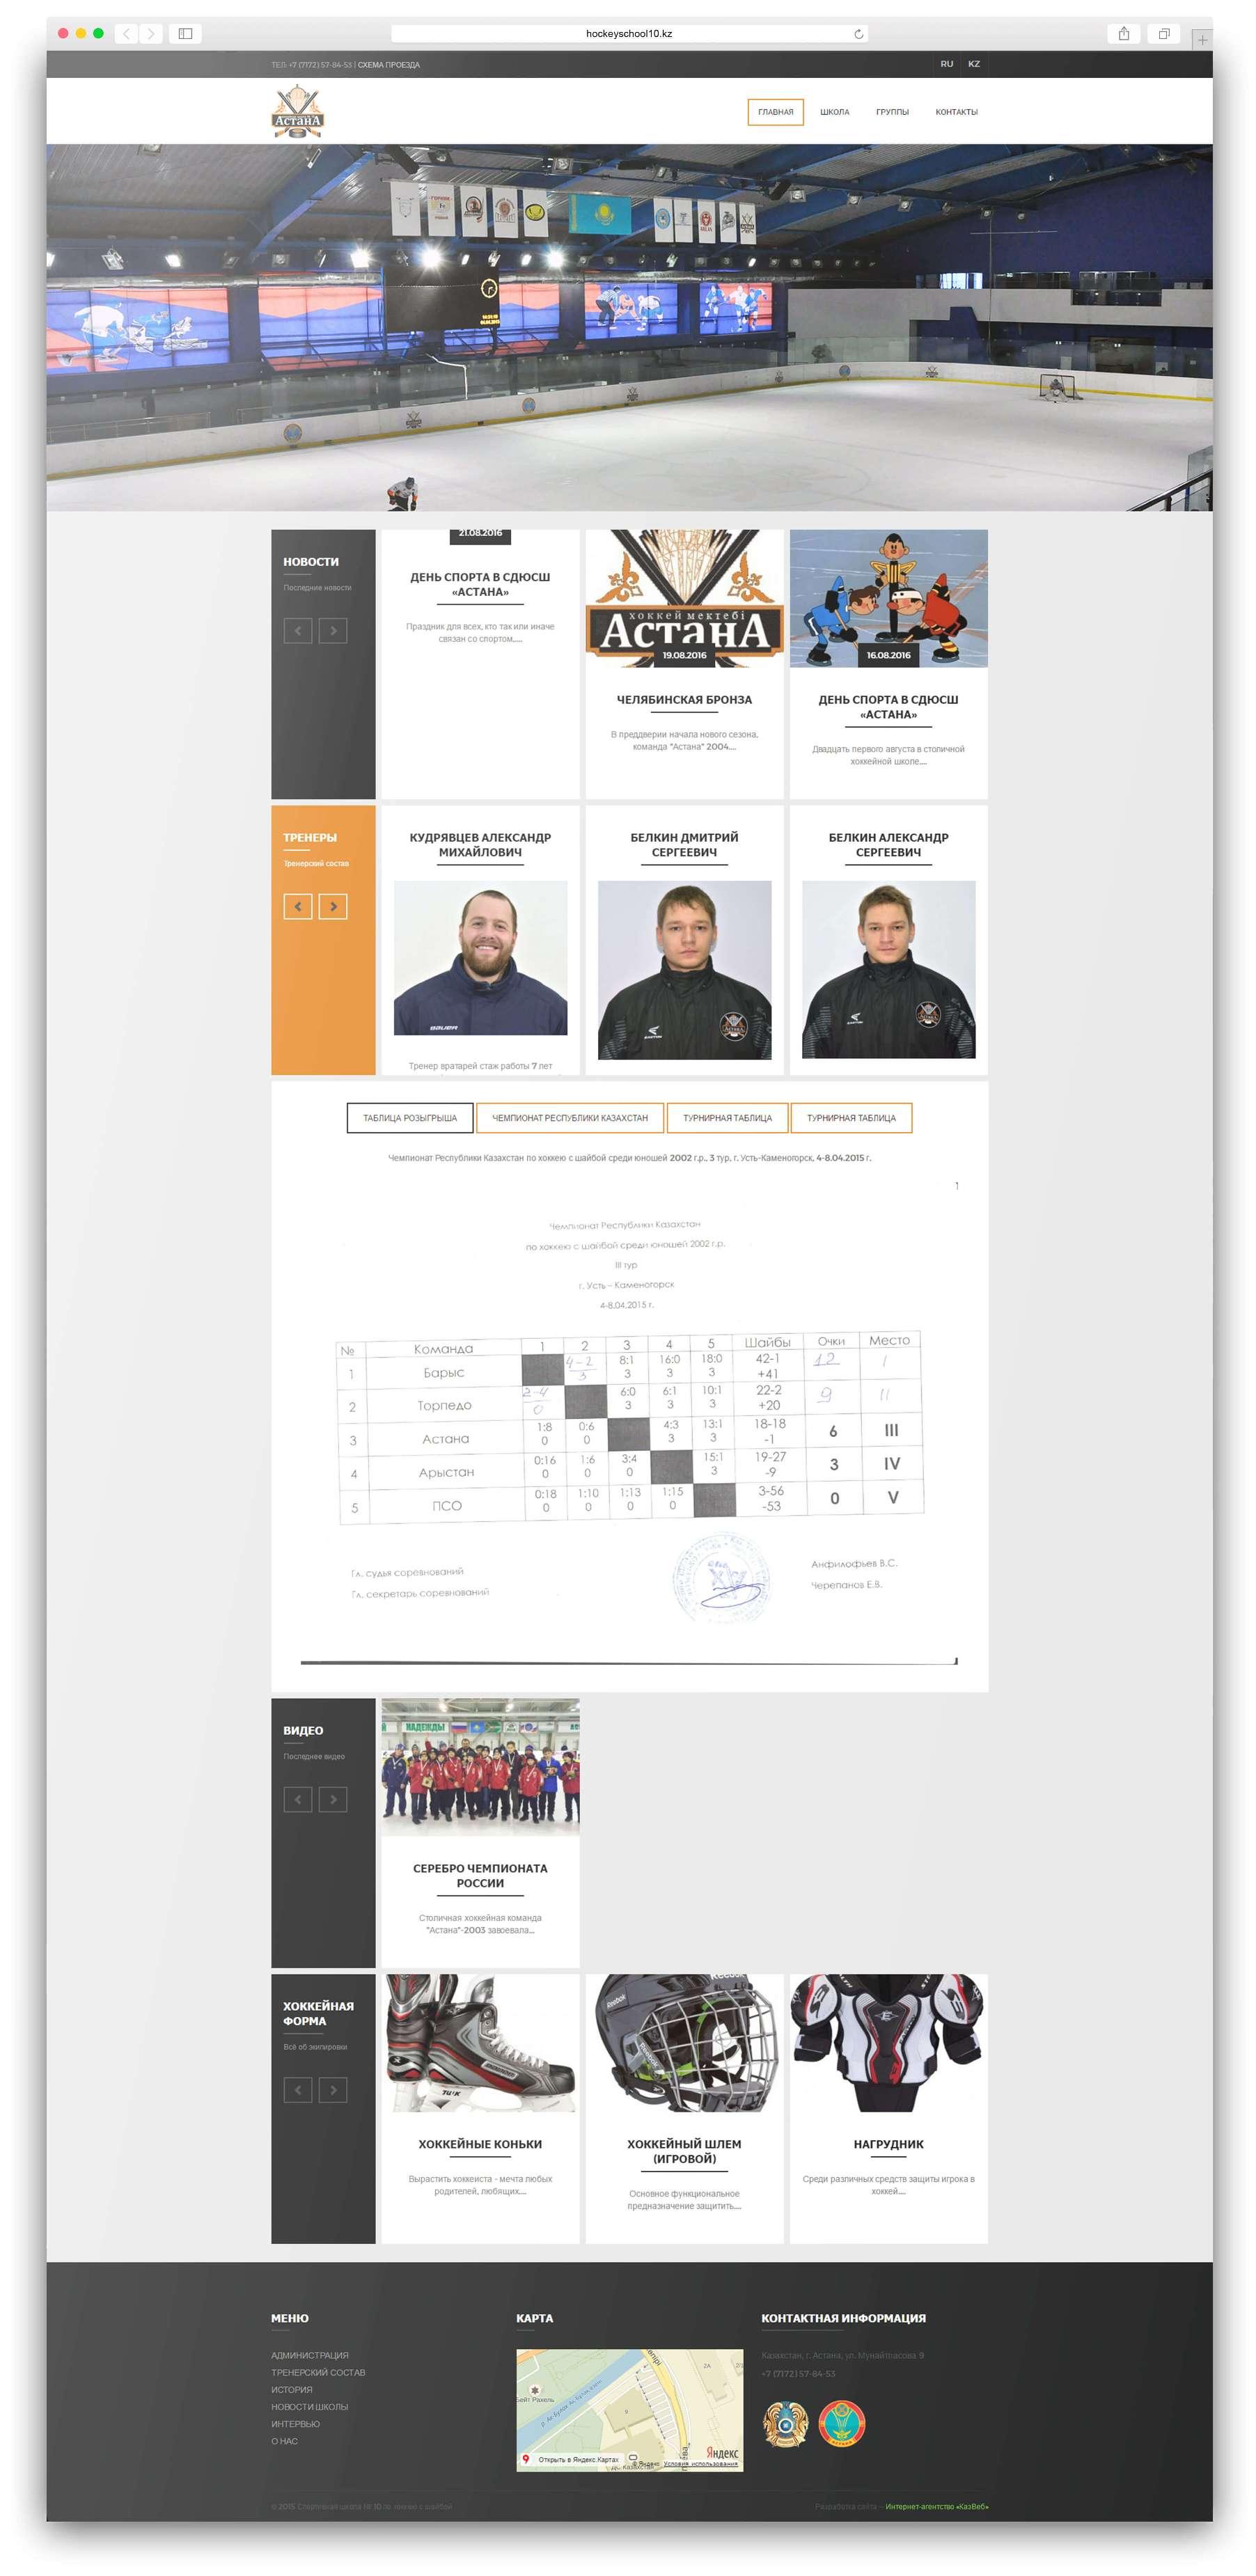 hockeyschool10-browser